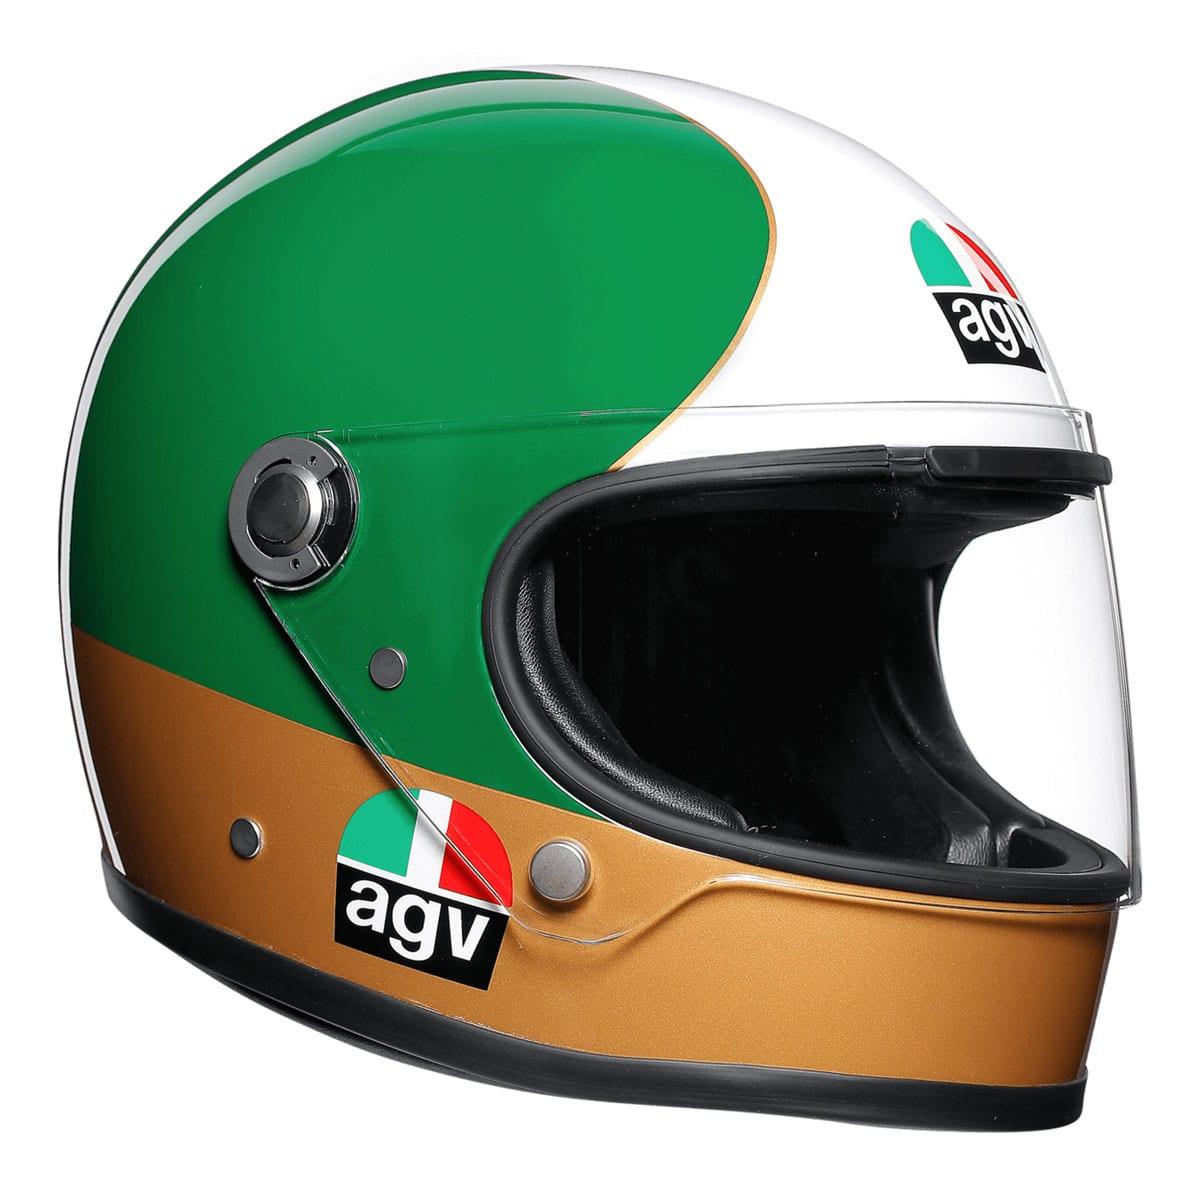 Agostini AGV helmet